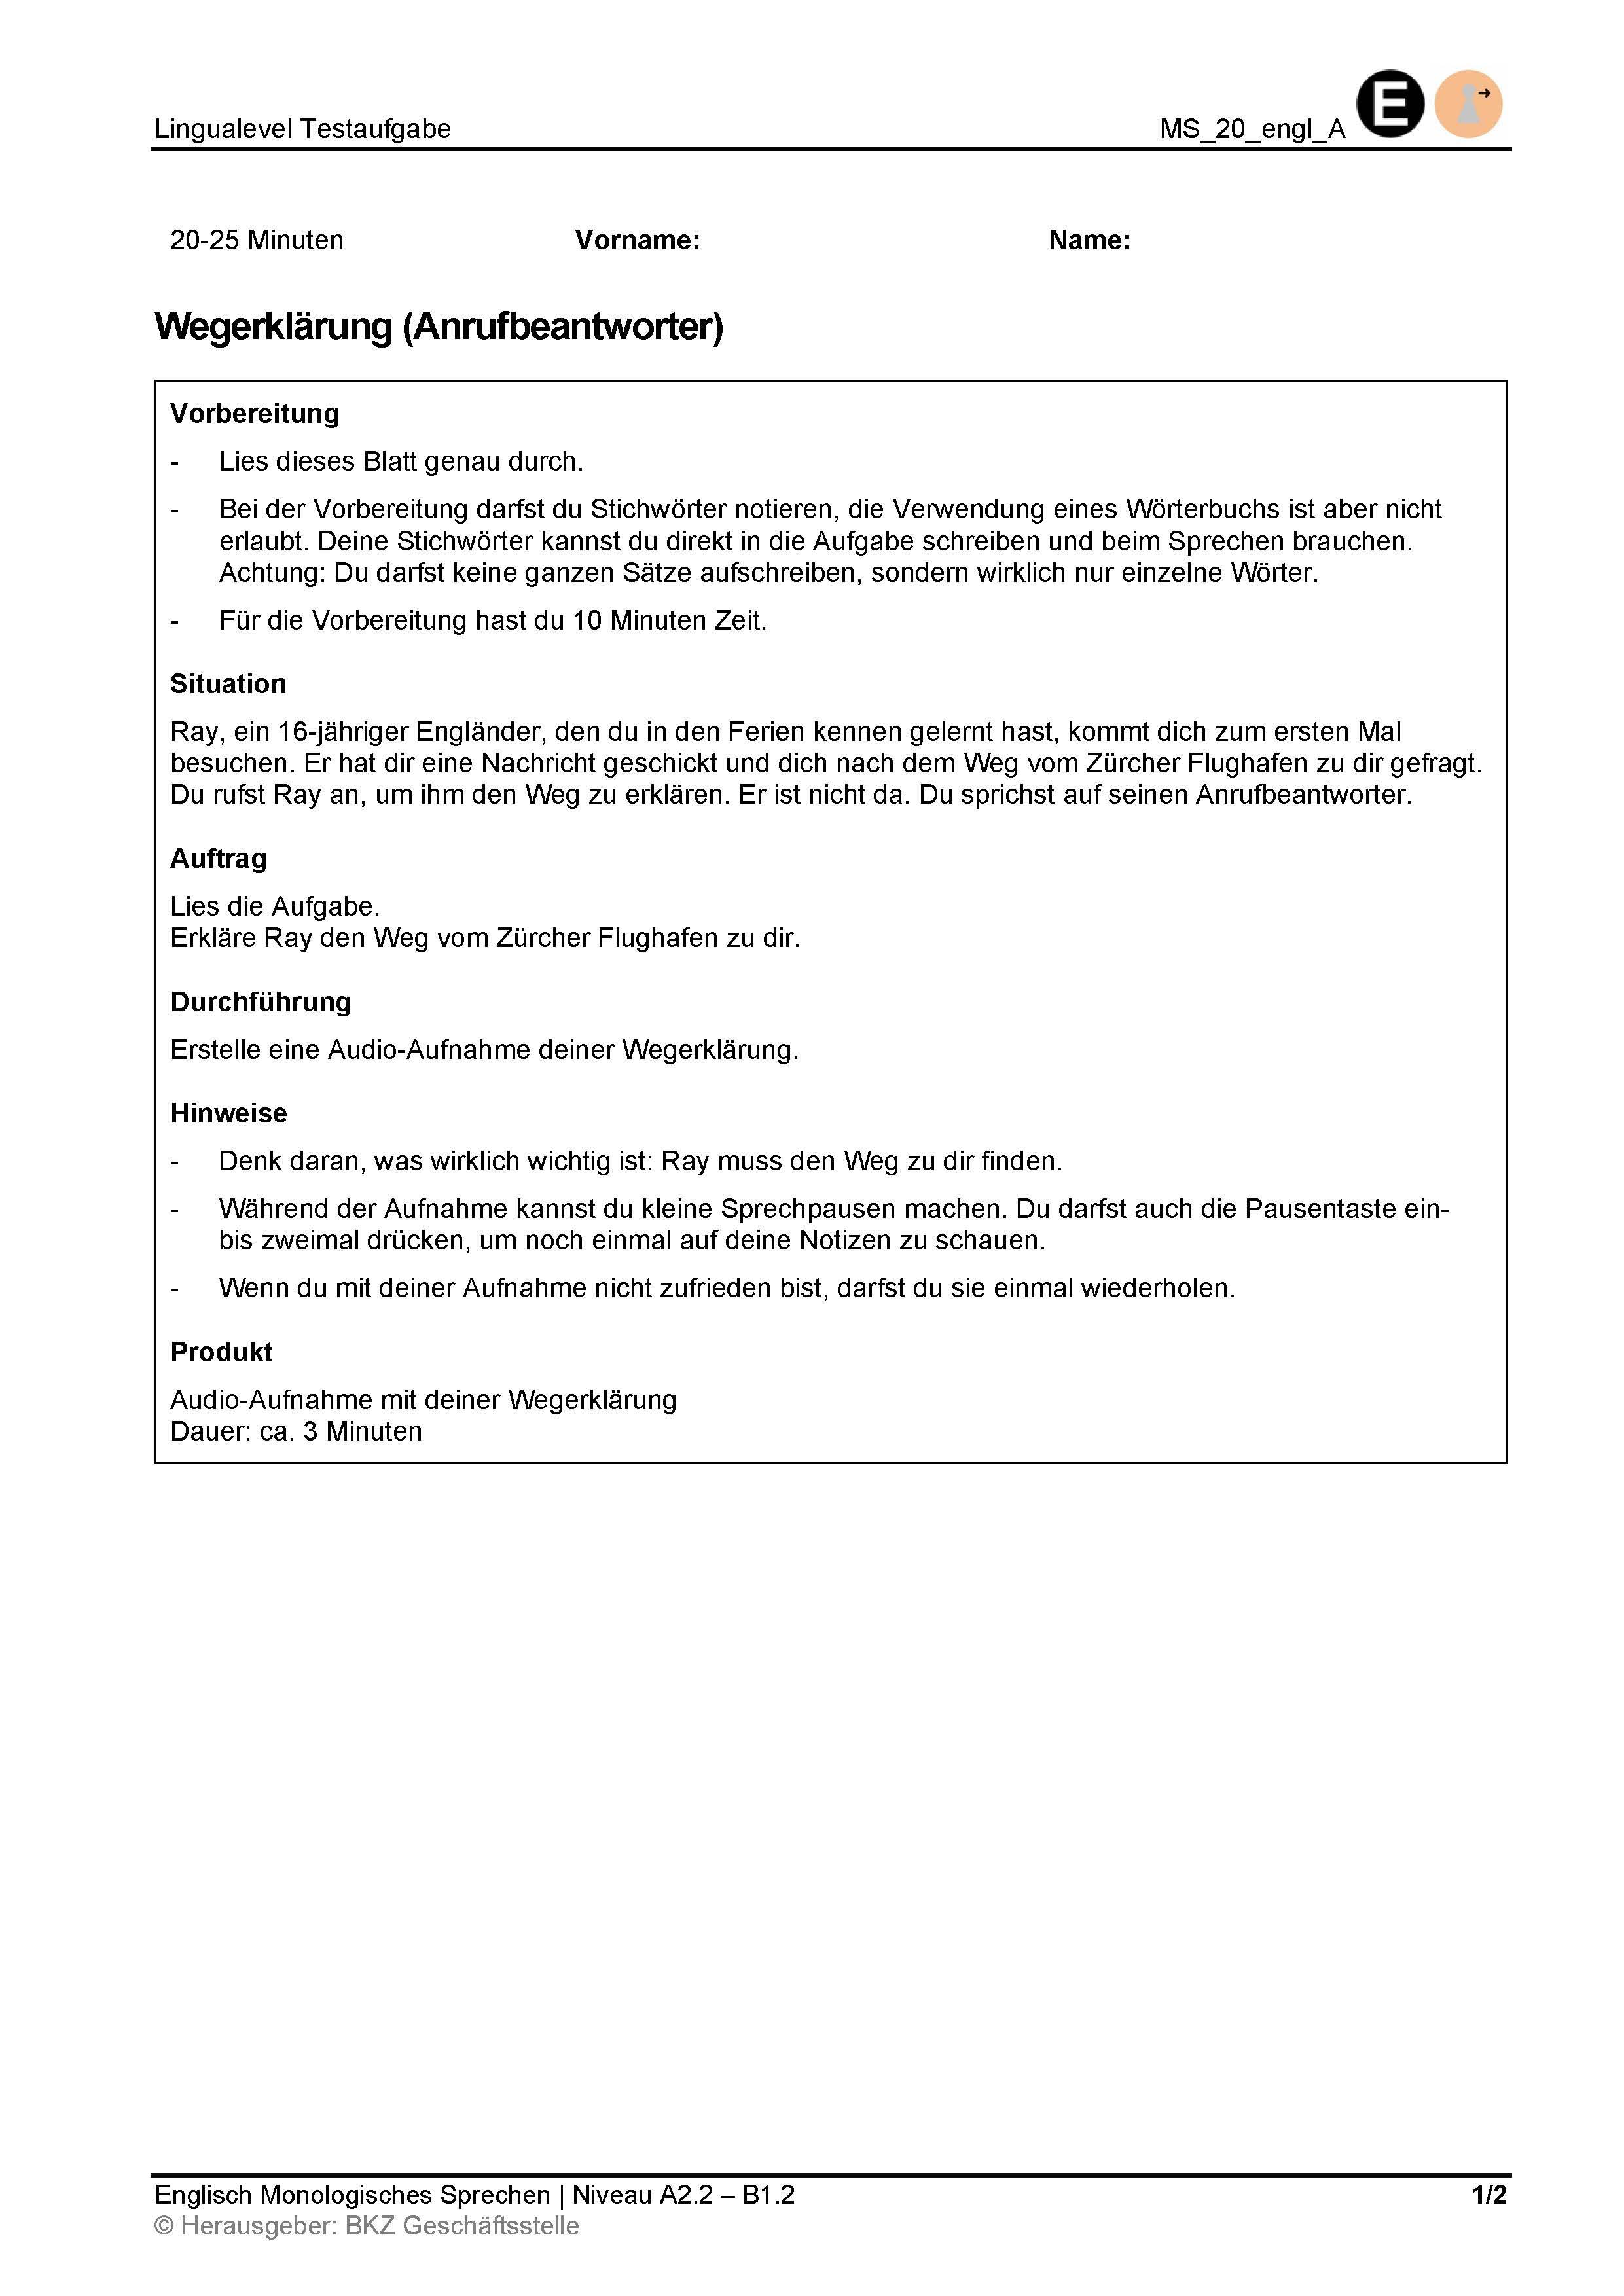 Preview image for LOM object Monologisches Sprechen: Wegerklärung (Anrufbeantworter)